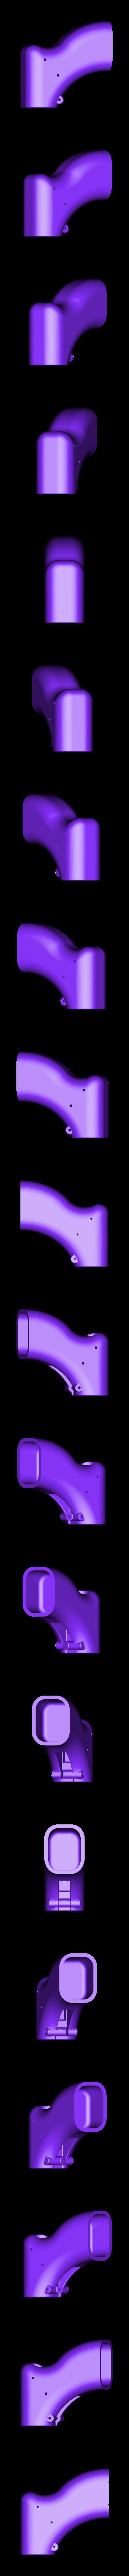 Deer_Gun_Frame.stl Download free STL file The Deer Gun (Historical Prop) • Object to 3D print, MuSSy